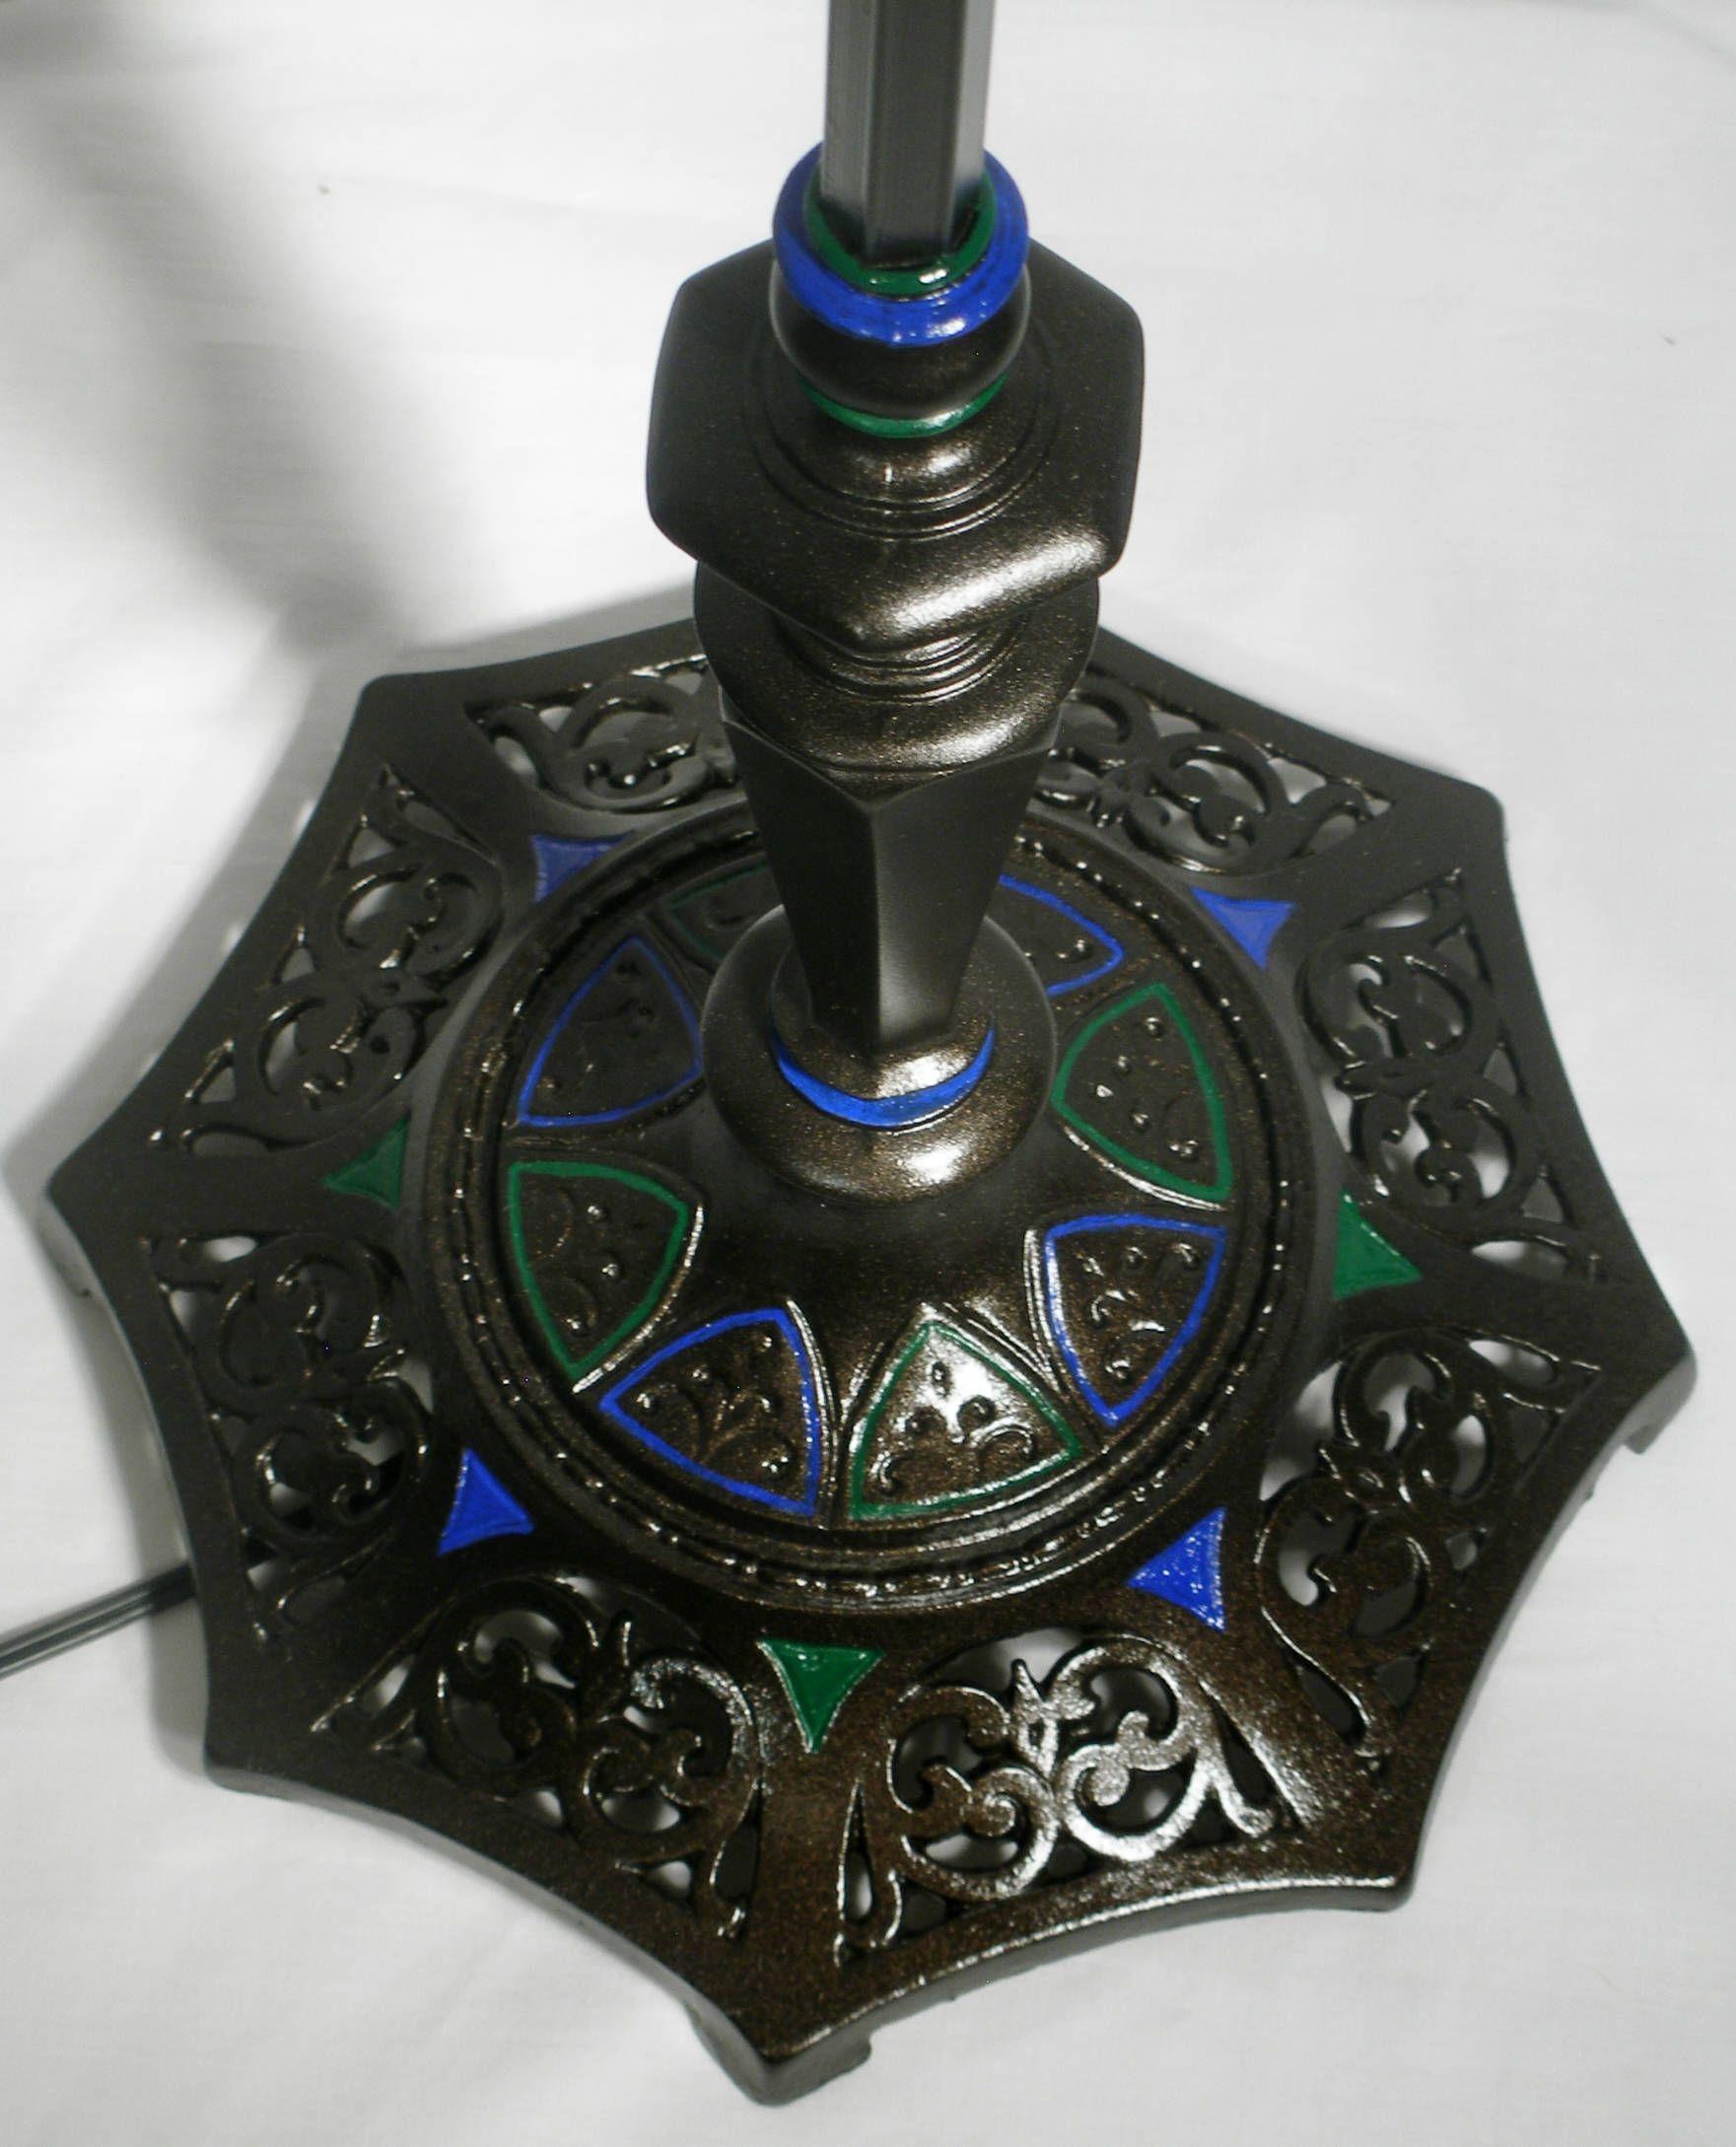 Vintage Floor Lamp Swan Neck Bridge Black Blue Green Rewired Reading Rewiring Antique Lamps Light By Oldstuffdave On Etsy